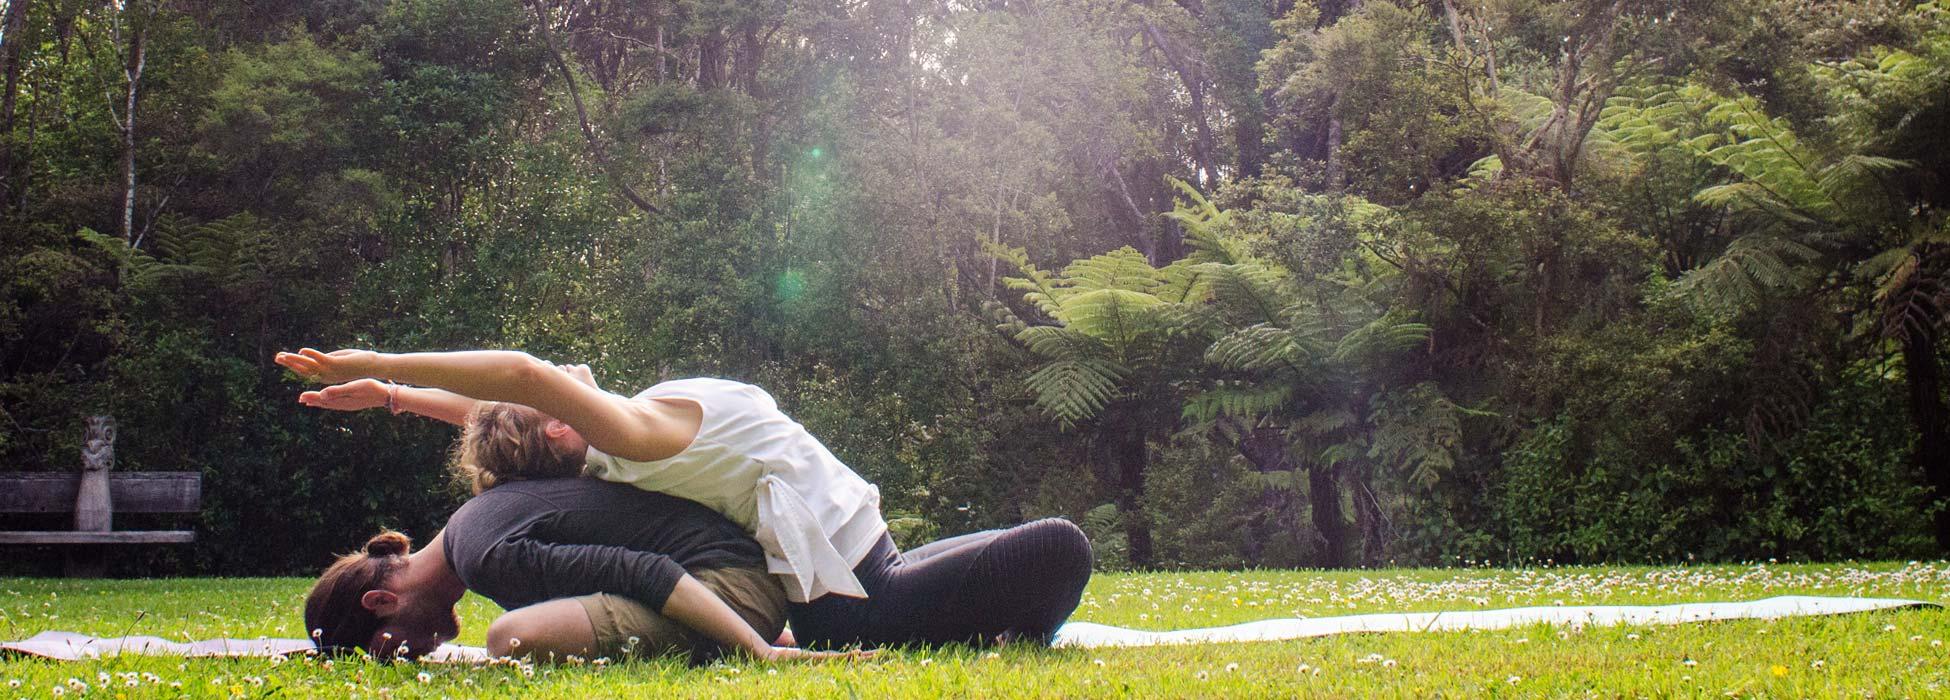 KP_slider_yoga_1950x700